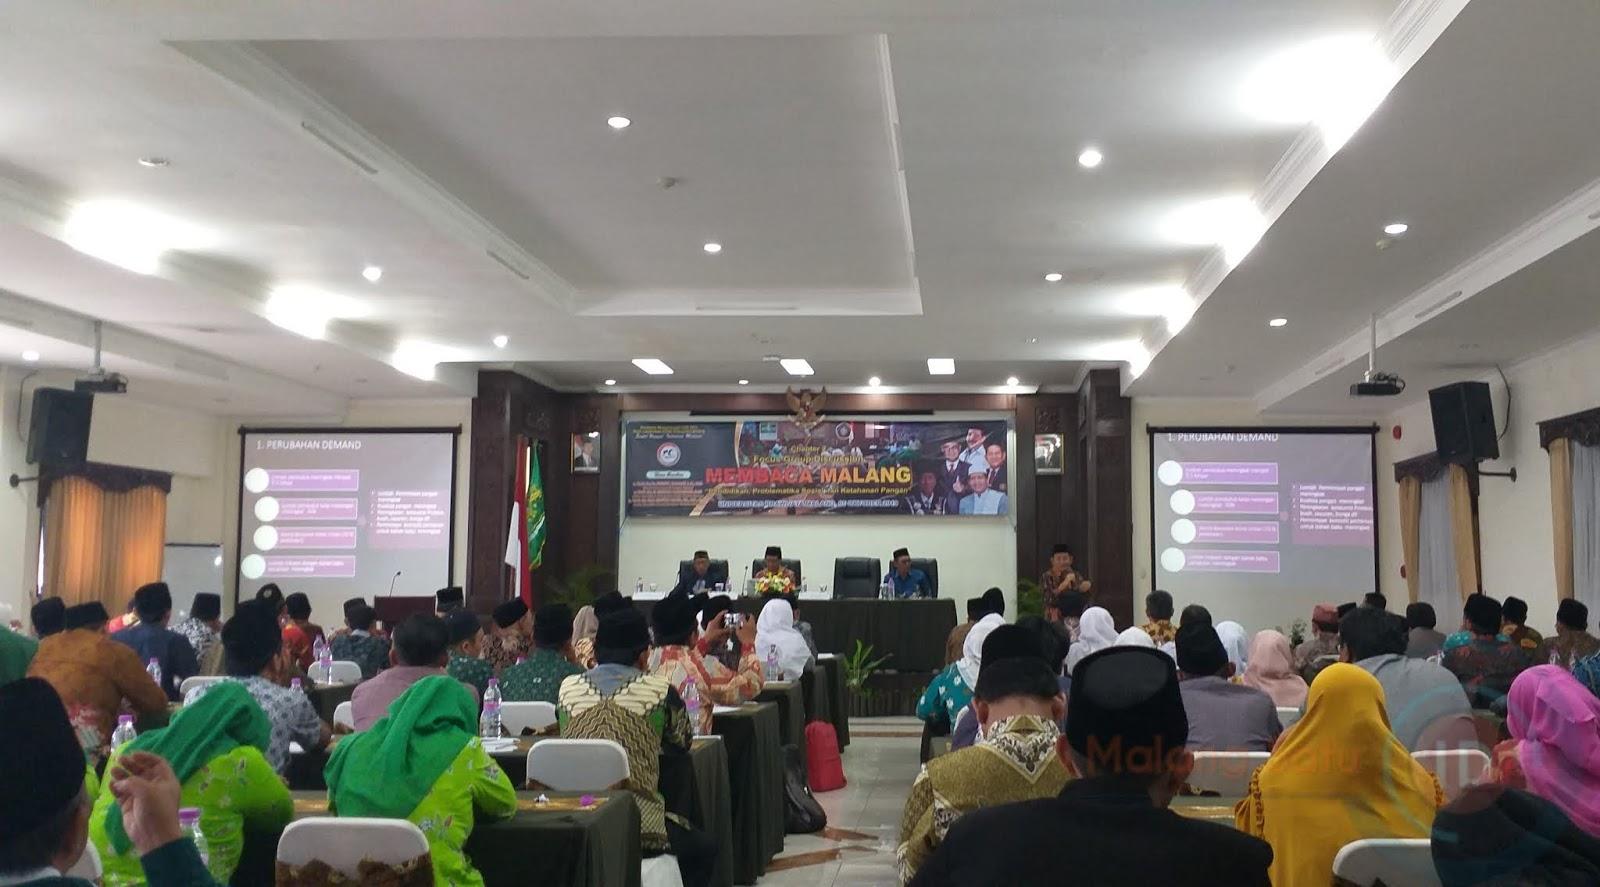 Kritisi Kebijakan Pendidikan Daerah, Lakpesdam NU Kabupaten Malang Gelar FGD Membaca Malang